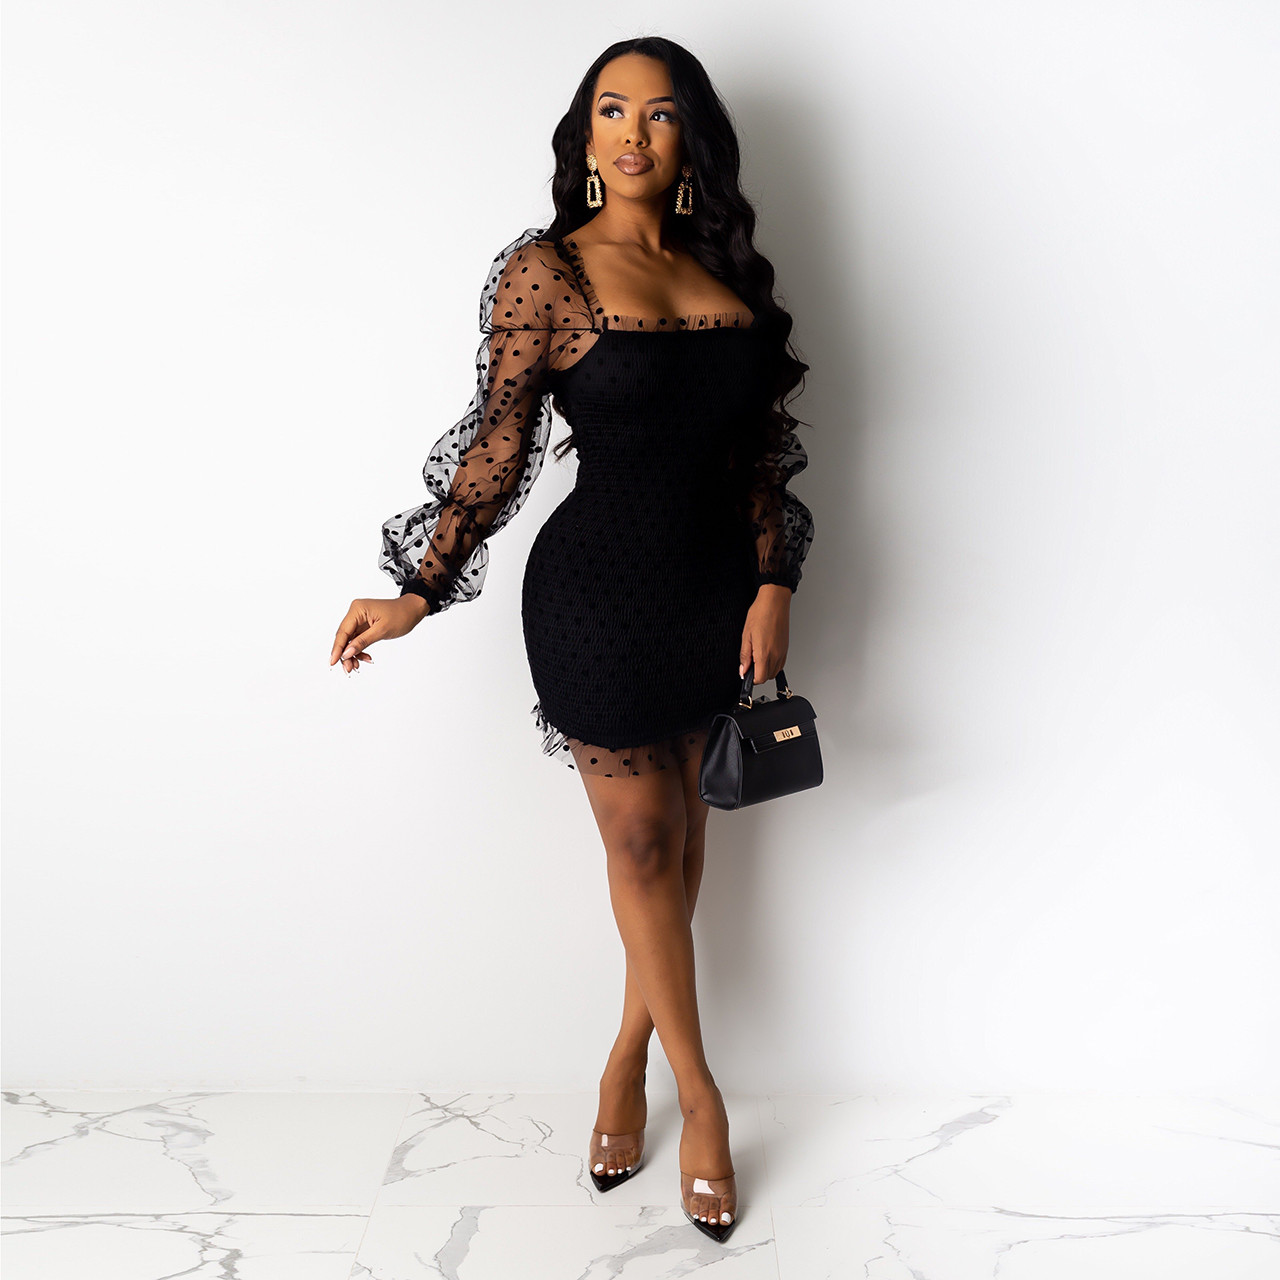 Wjustforu Strapless Sexy Sheer Mesh Mini Dress For Women Black Elegant Skinny Party Dreses Female Sleeveless Casual Short Dress Dresses Women's Clothing & Accessories